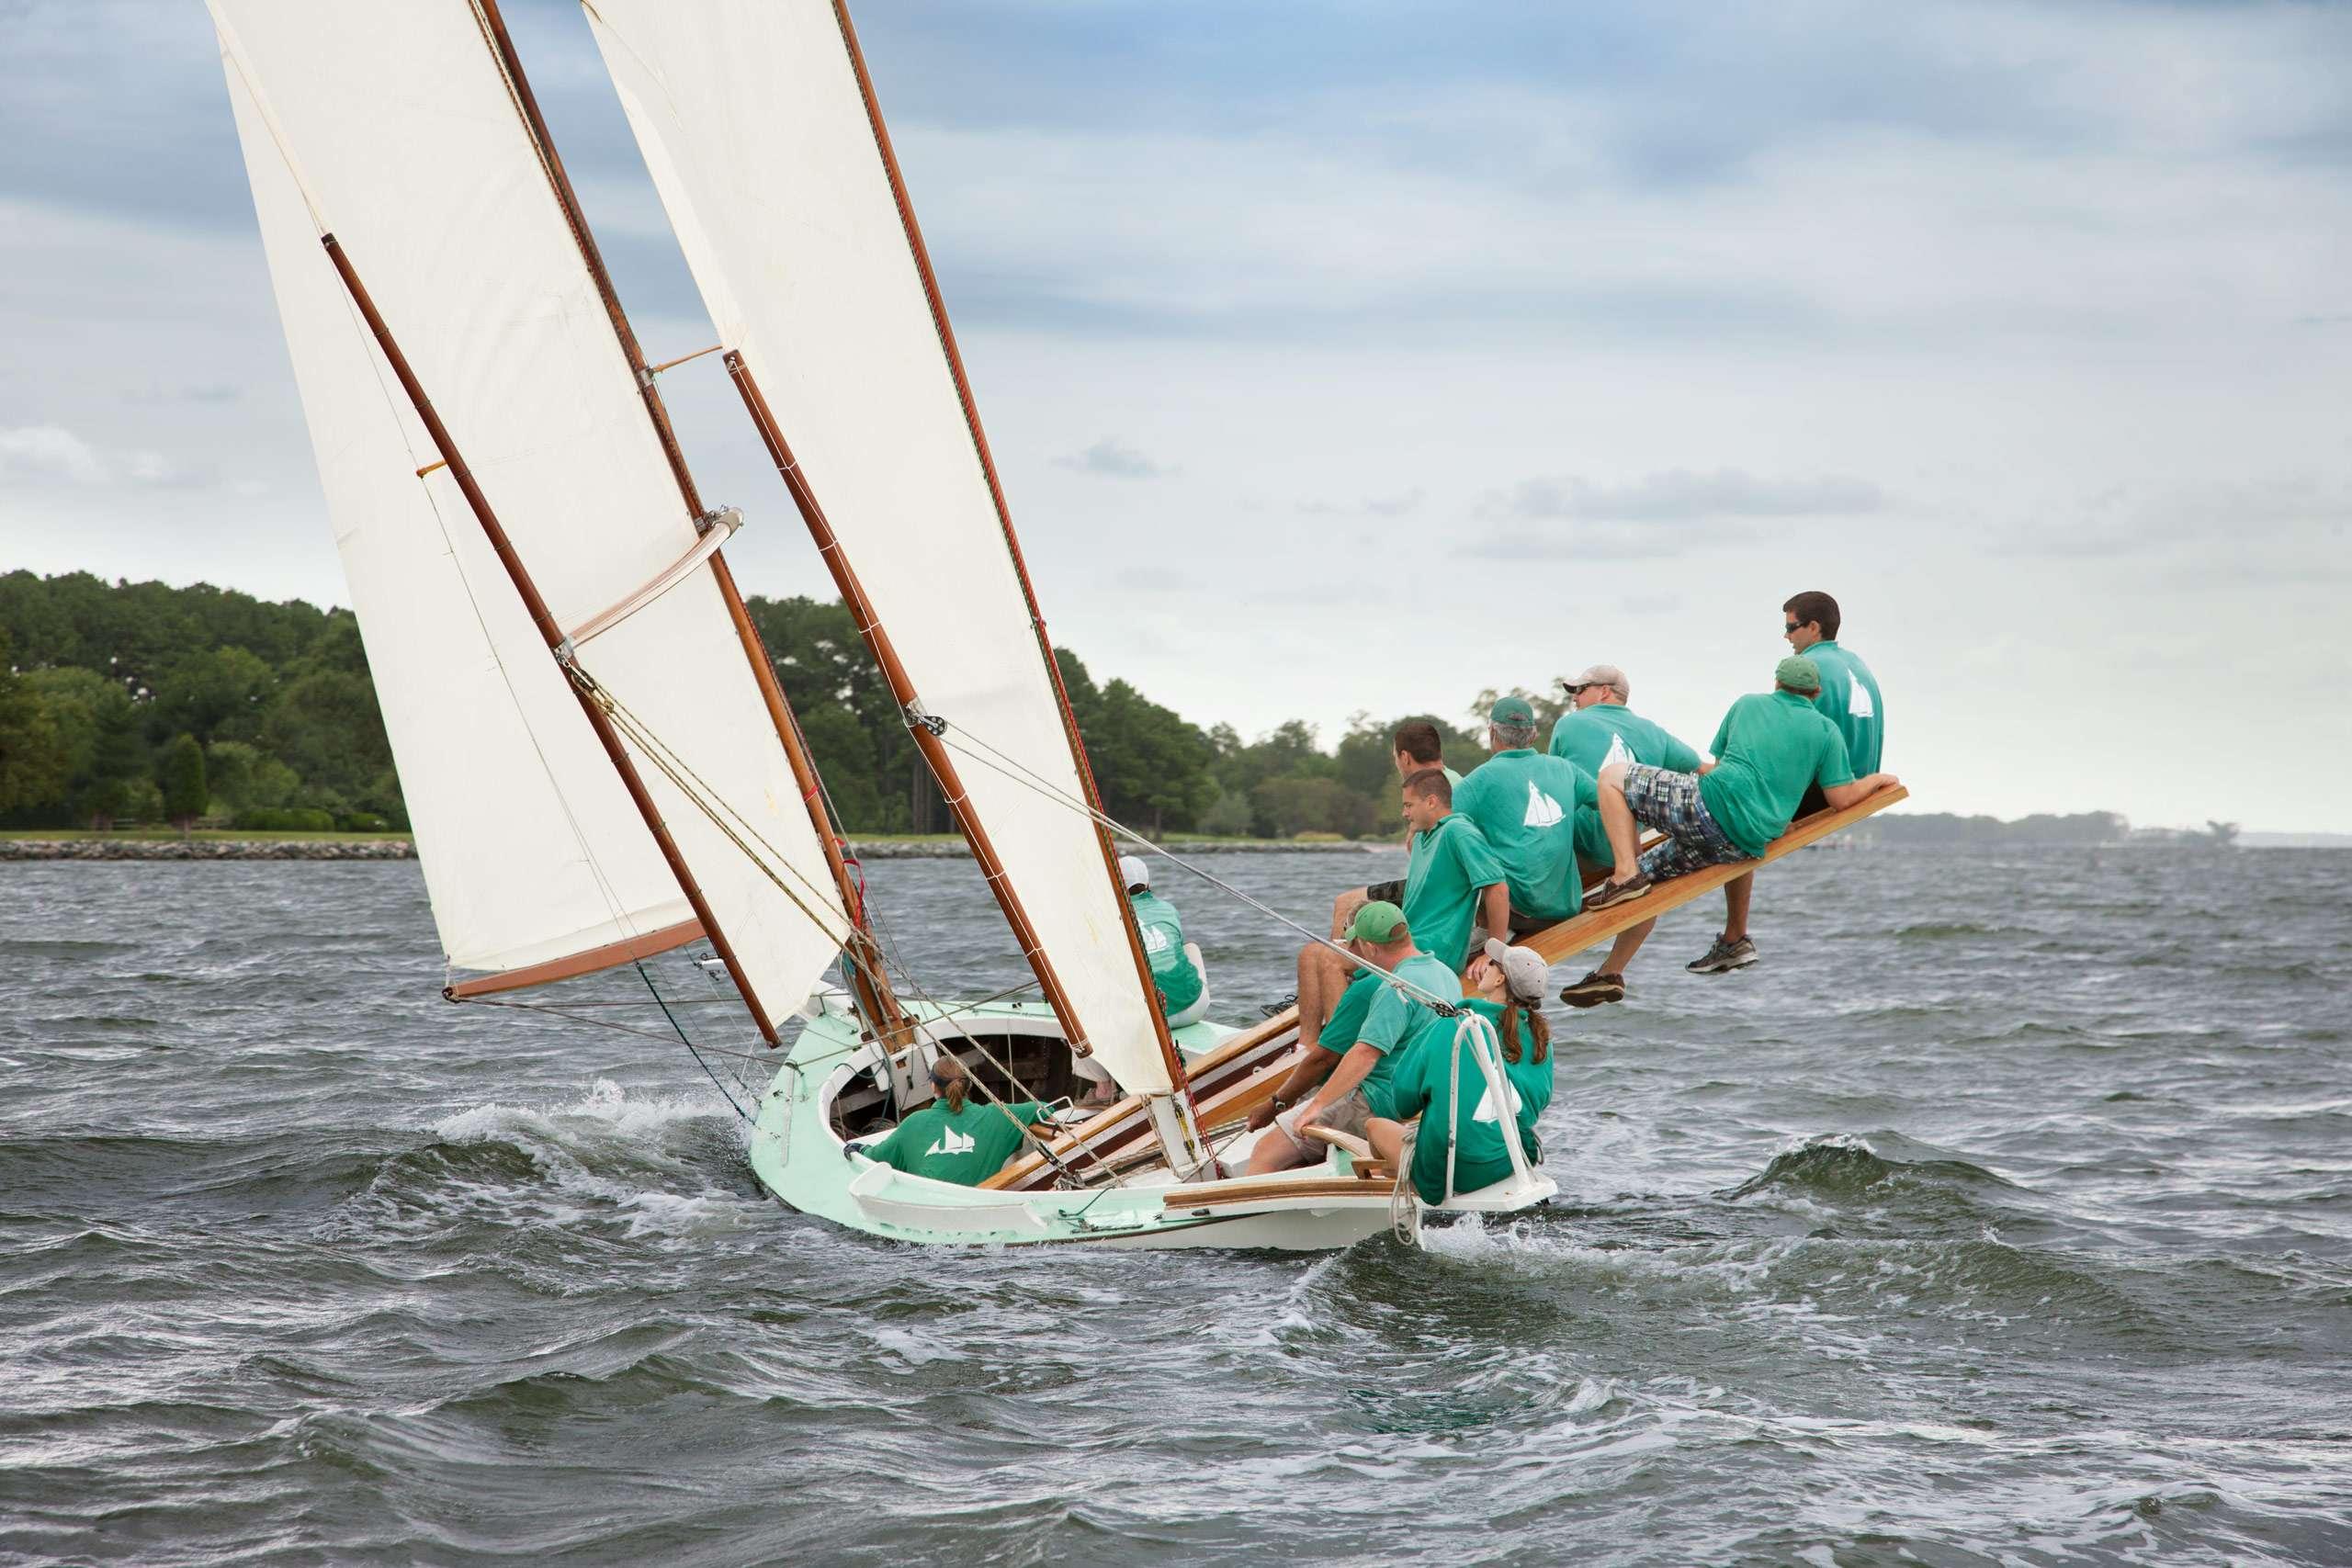 PORTFOLIO - Sailing - Log Canoes #29   PCG568